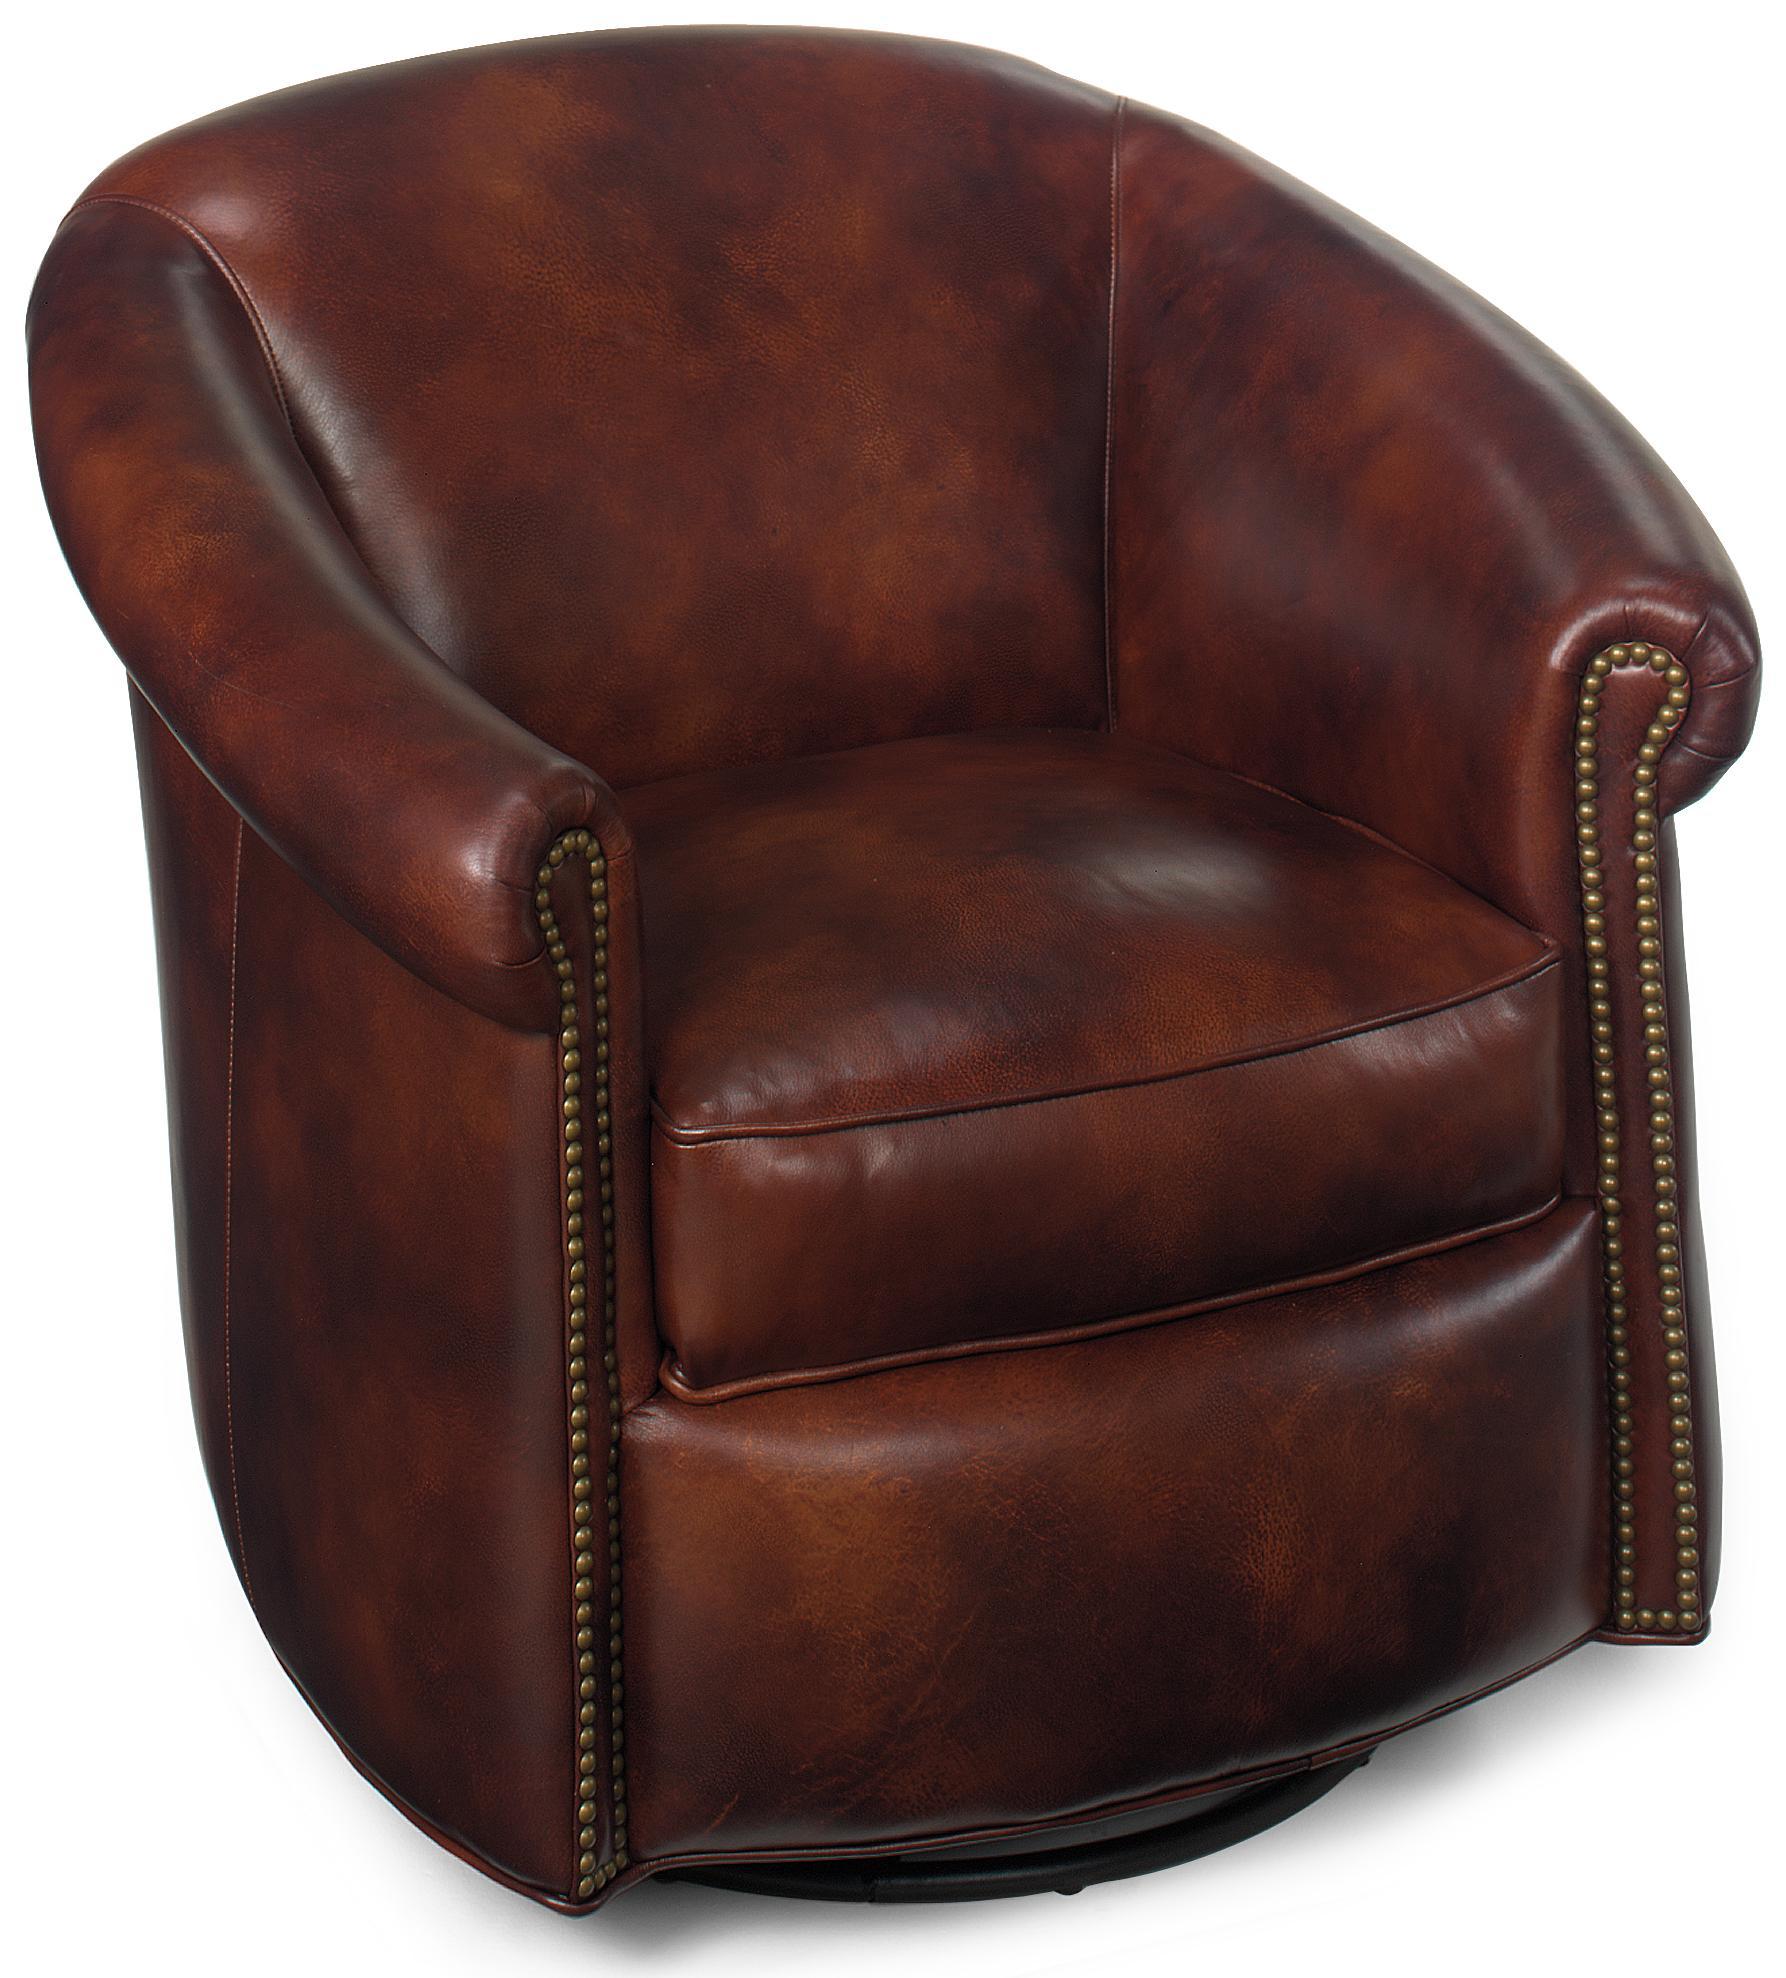 Swivel Tub Chairs Marietta Swivel Tub Chair by Bradington Young at Baer's Furniture